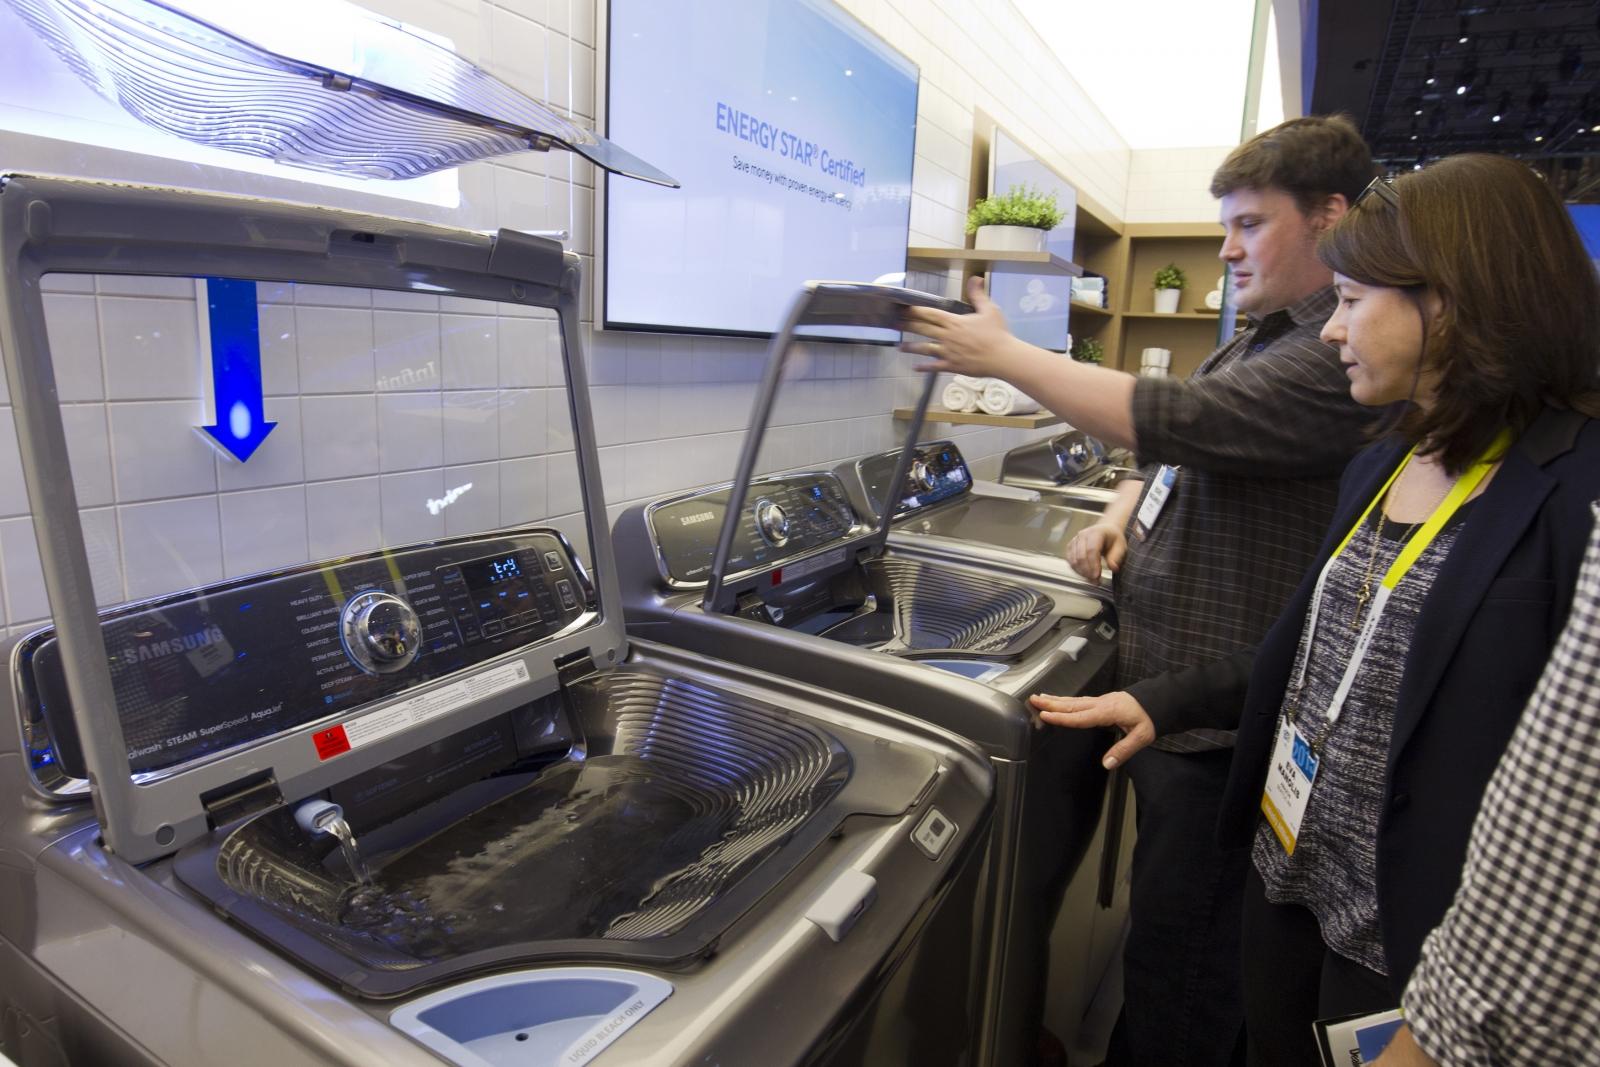 Samsung exploding washing machines recall check